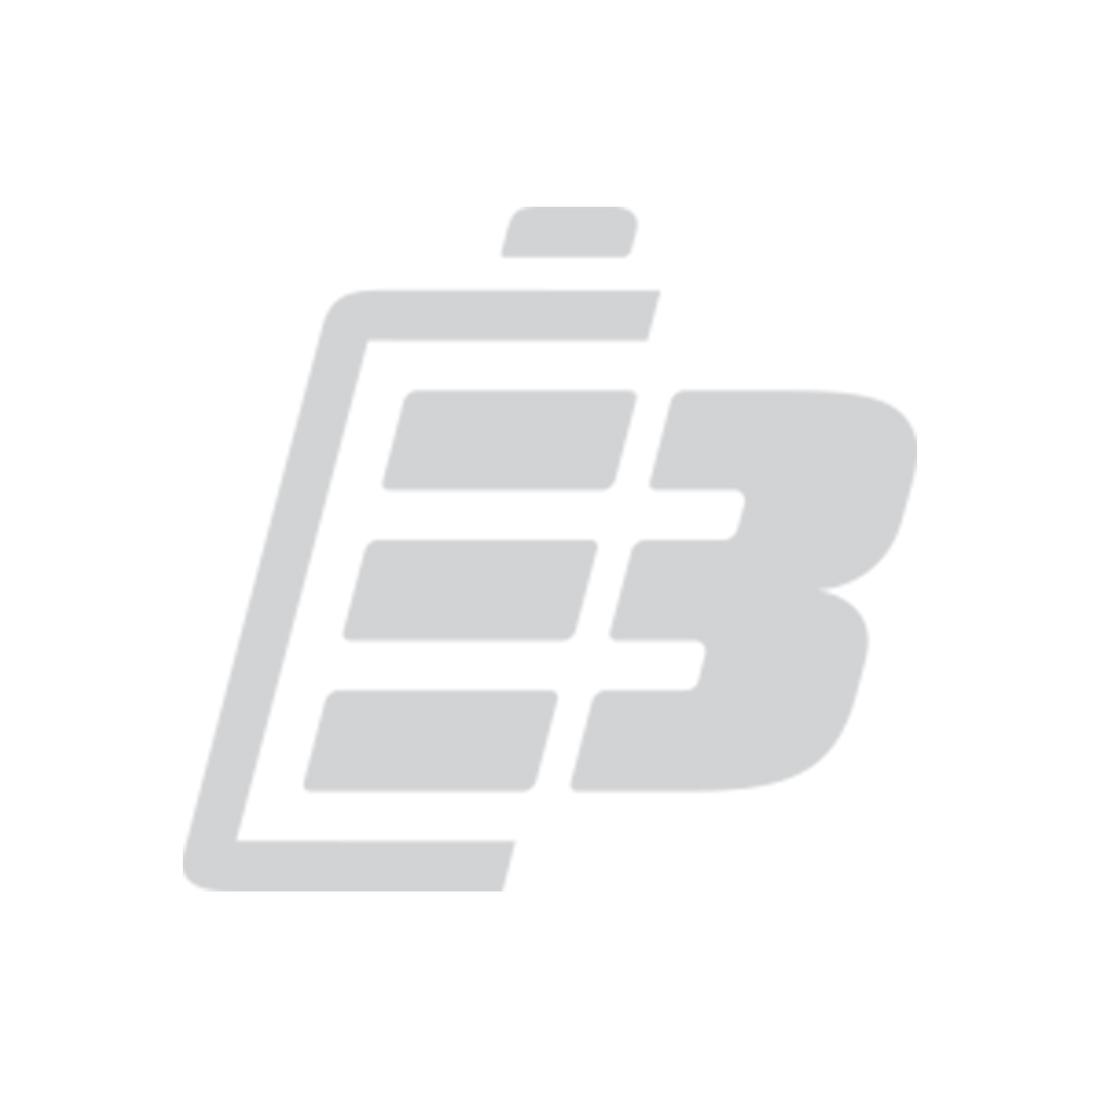 Power tool battery Makita 14.4V 2.0Ah_1